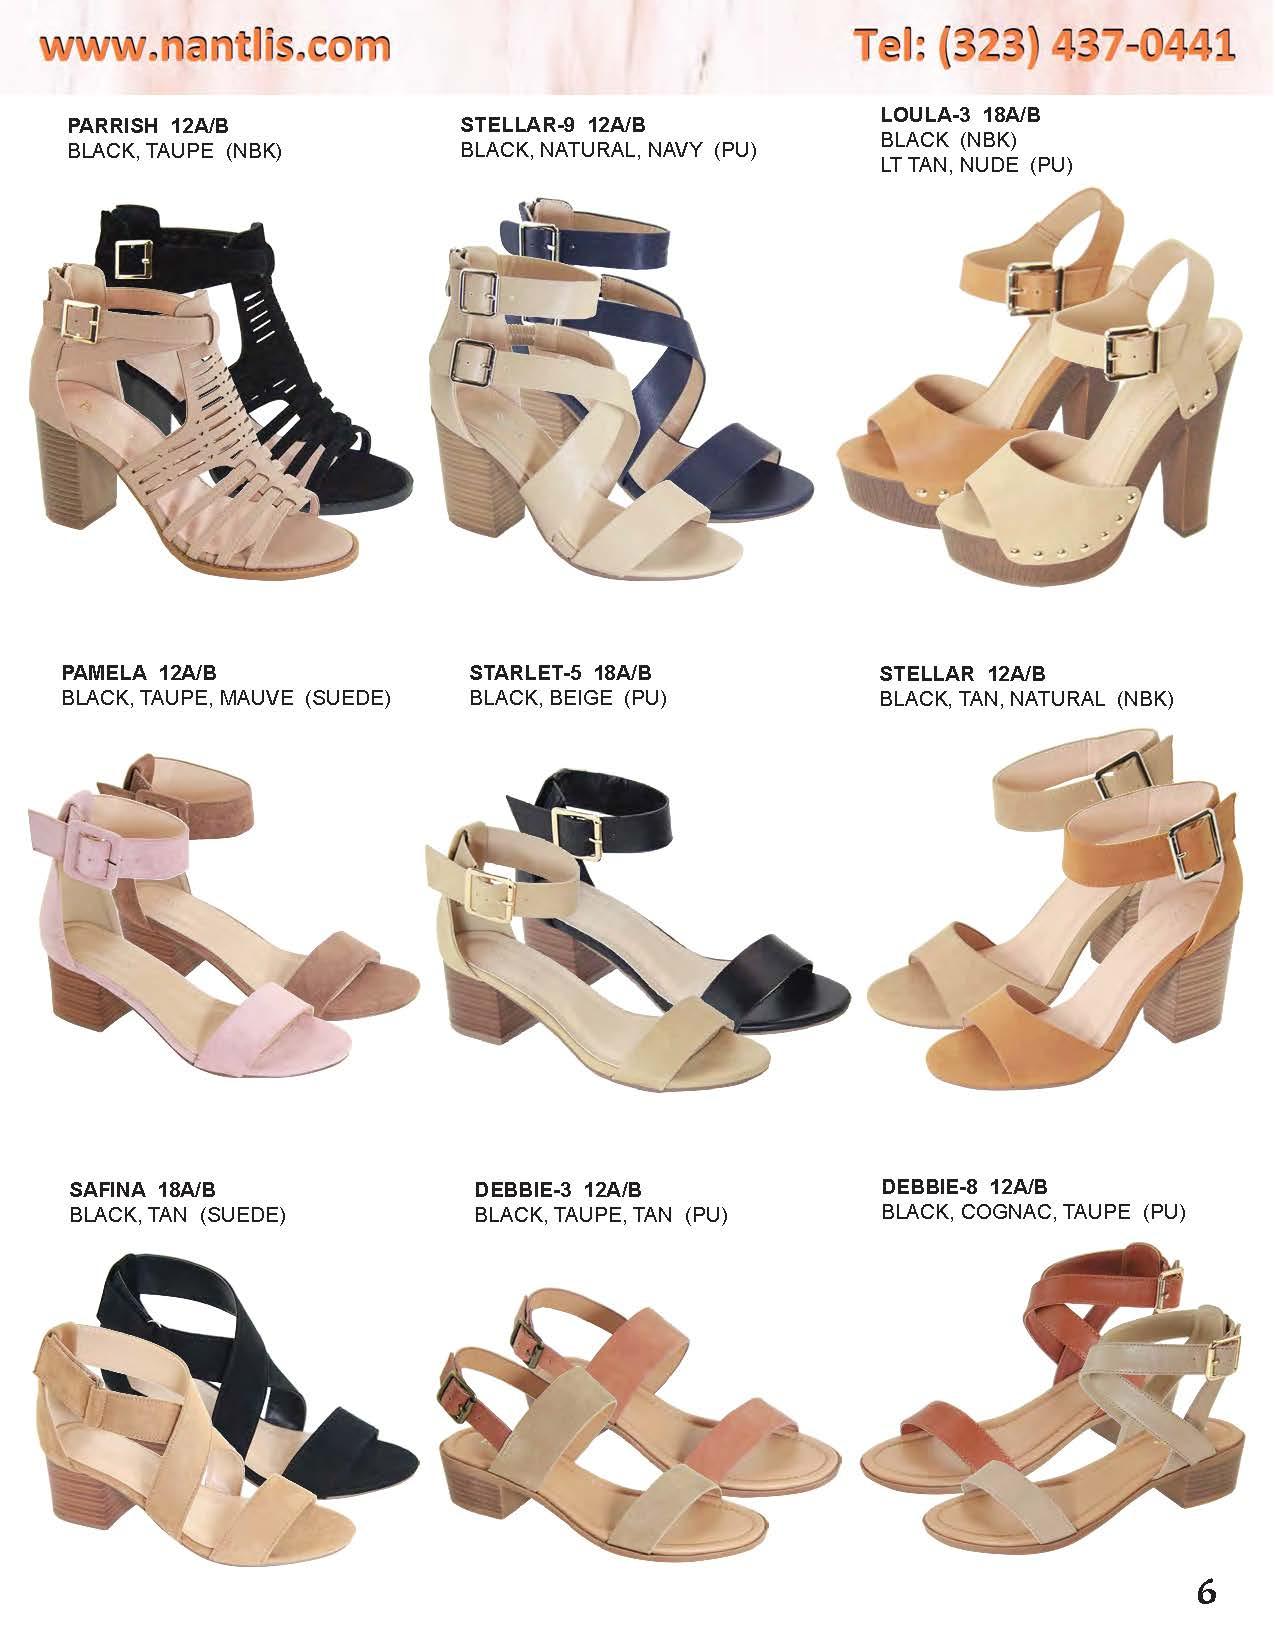 e25f124b Nantlis Catalogo Zapatos de Mujer mayoreo Vol 1 Wholesale womens  Shoes_Page_07